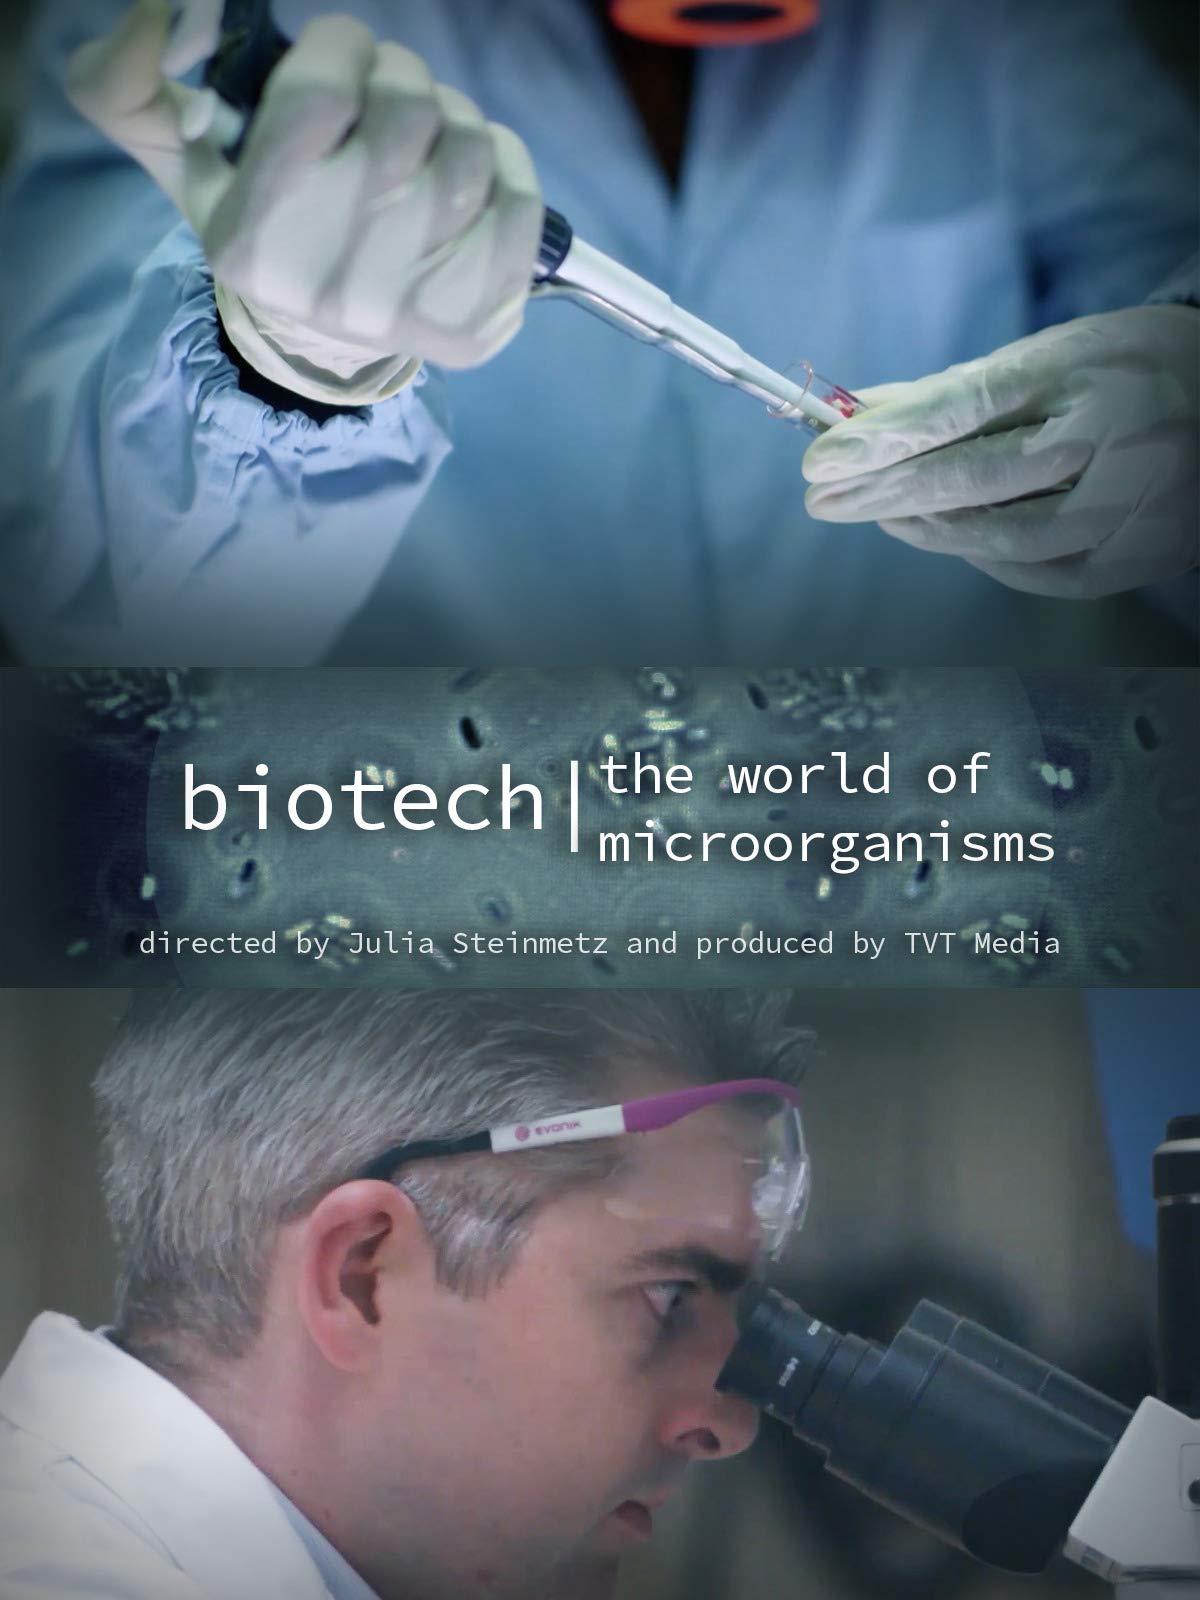 Biotech: The World of Microorganisms